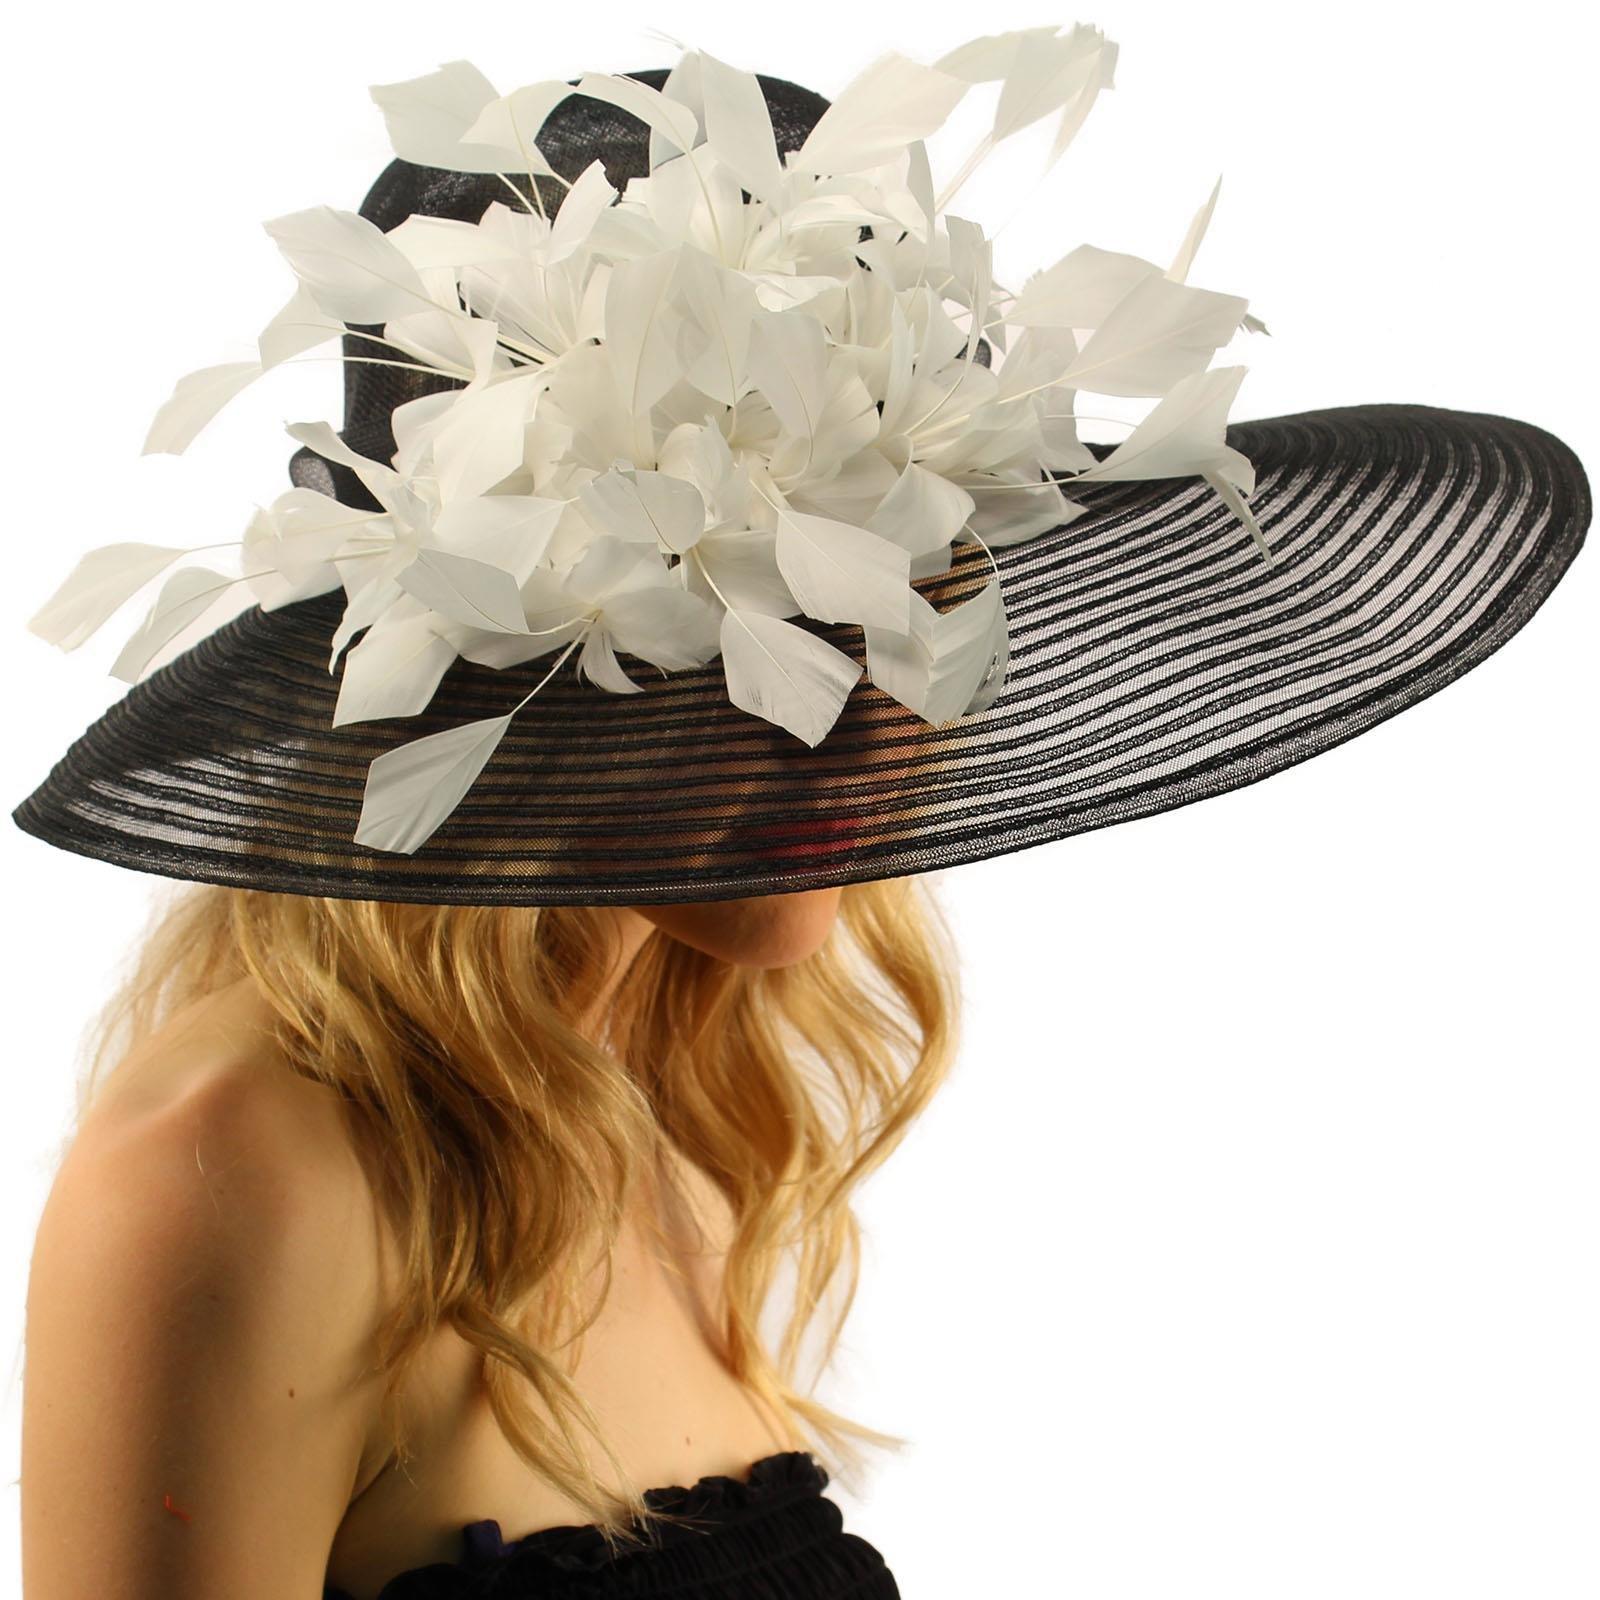 SK Hat shop Spectacular Spray Feathers Sinamay Derby Floppy Wide Brim 7'' Dress Hat Black/White